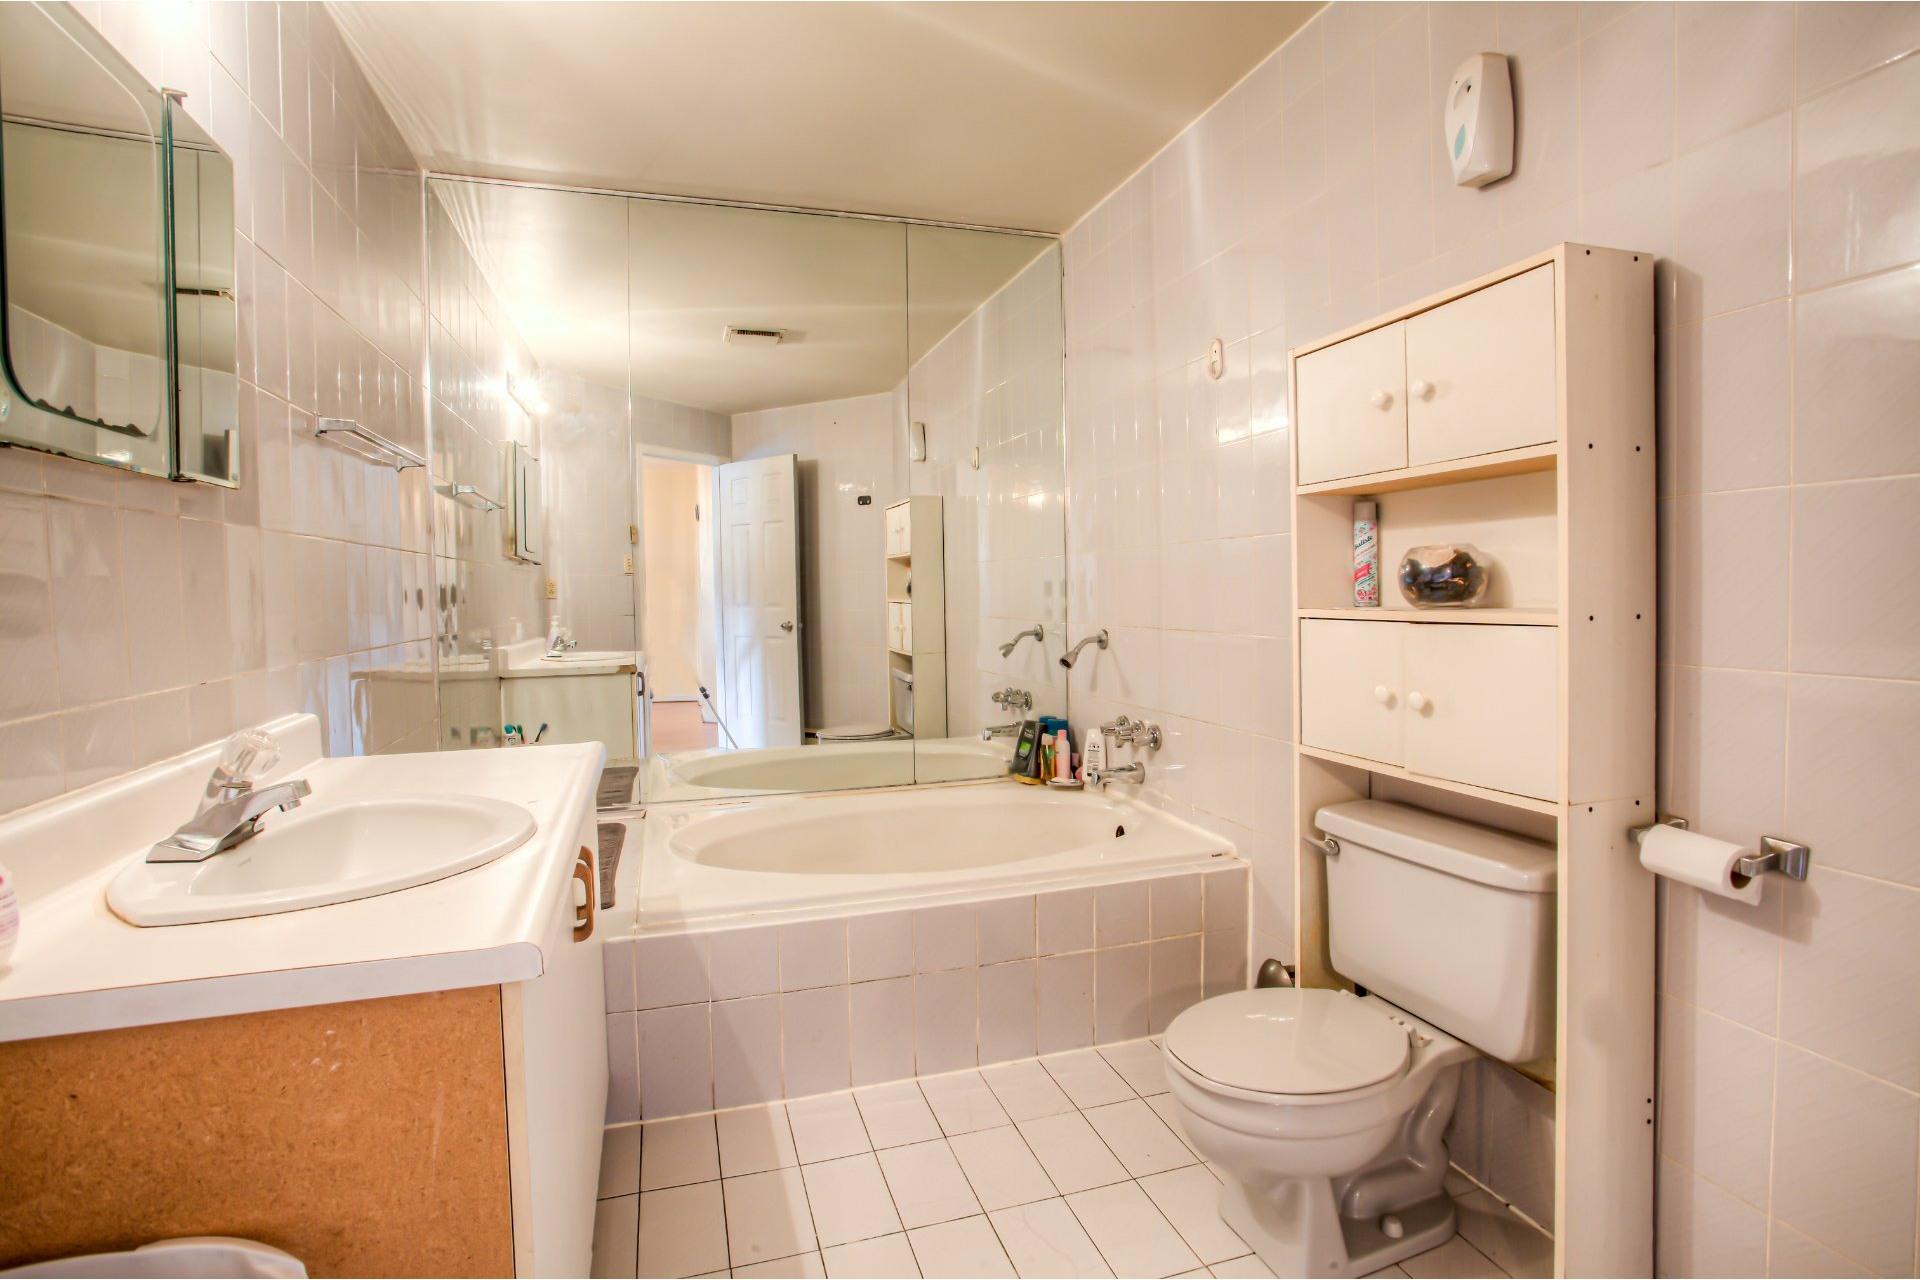 image 14 - House For sale Pierrefonds-Roxboro Montréal  - 8 rooms